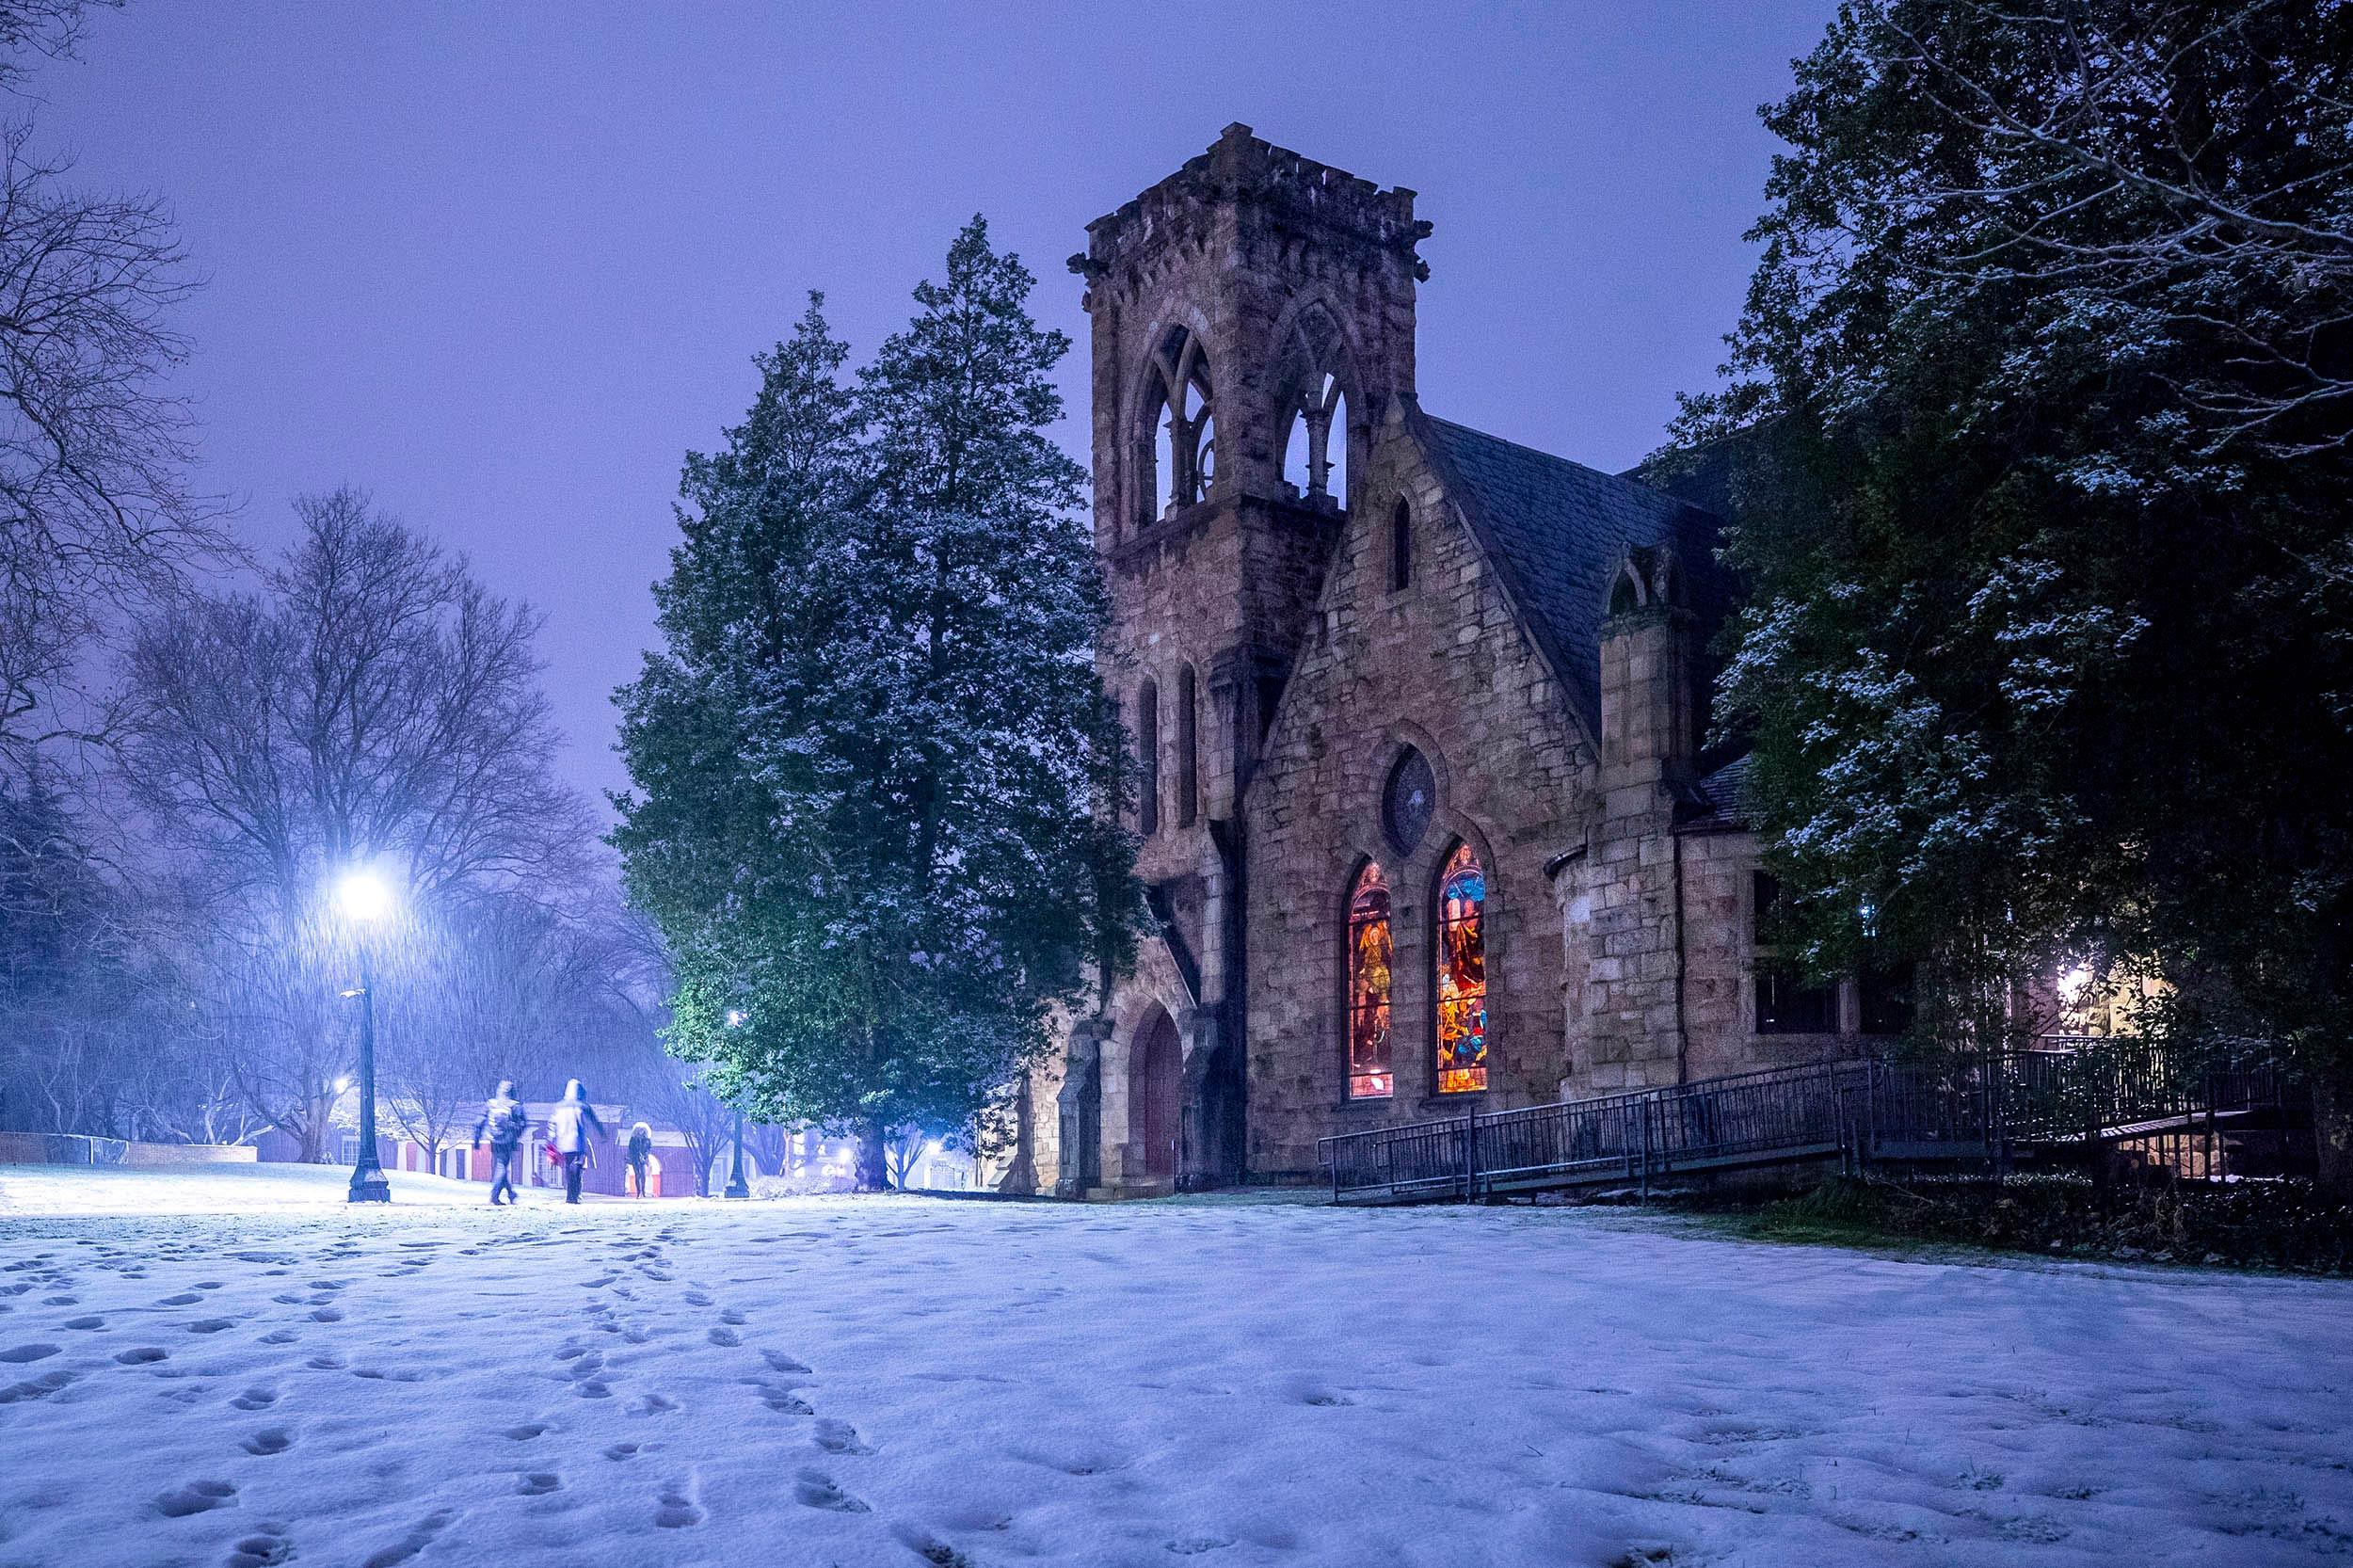 The Bigger Picture: A Snowy Sanctuary